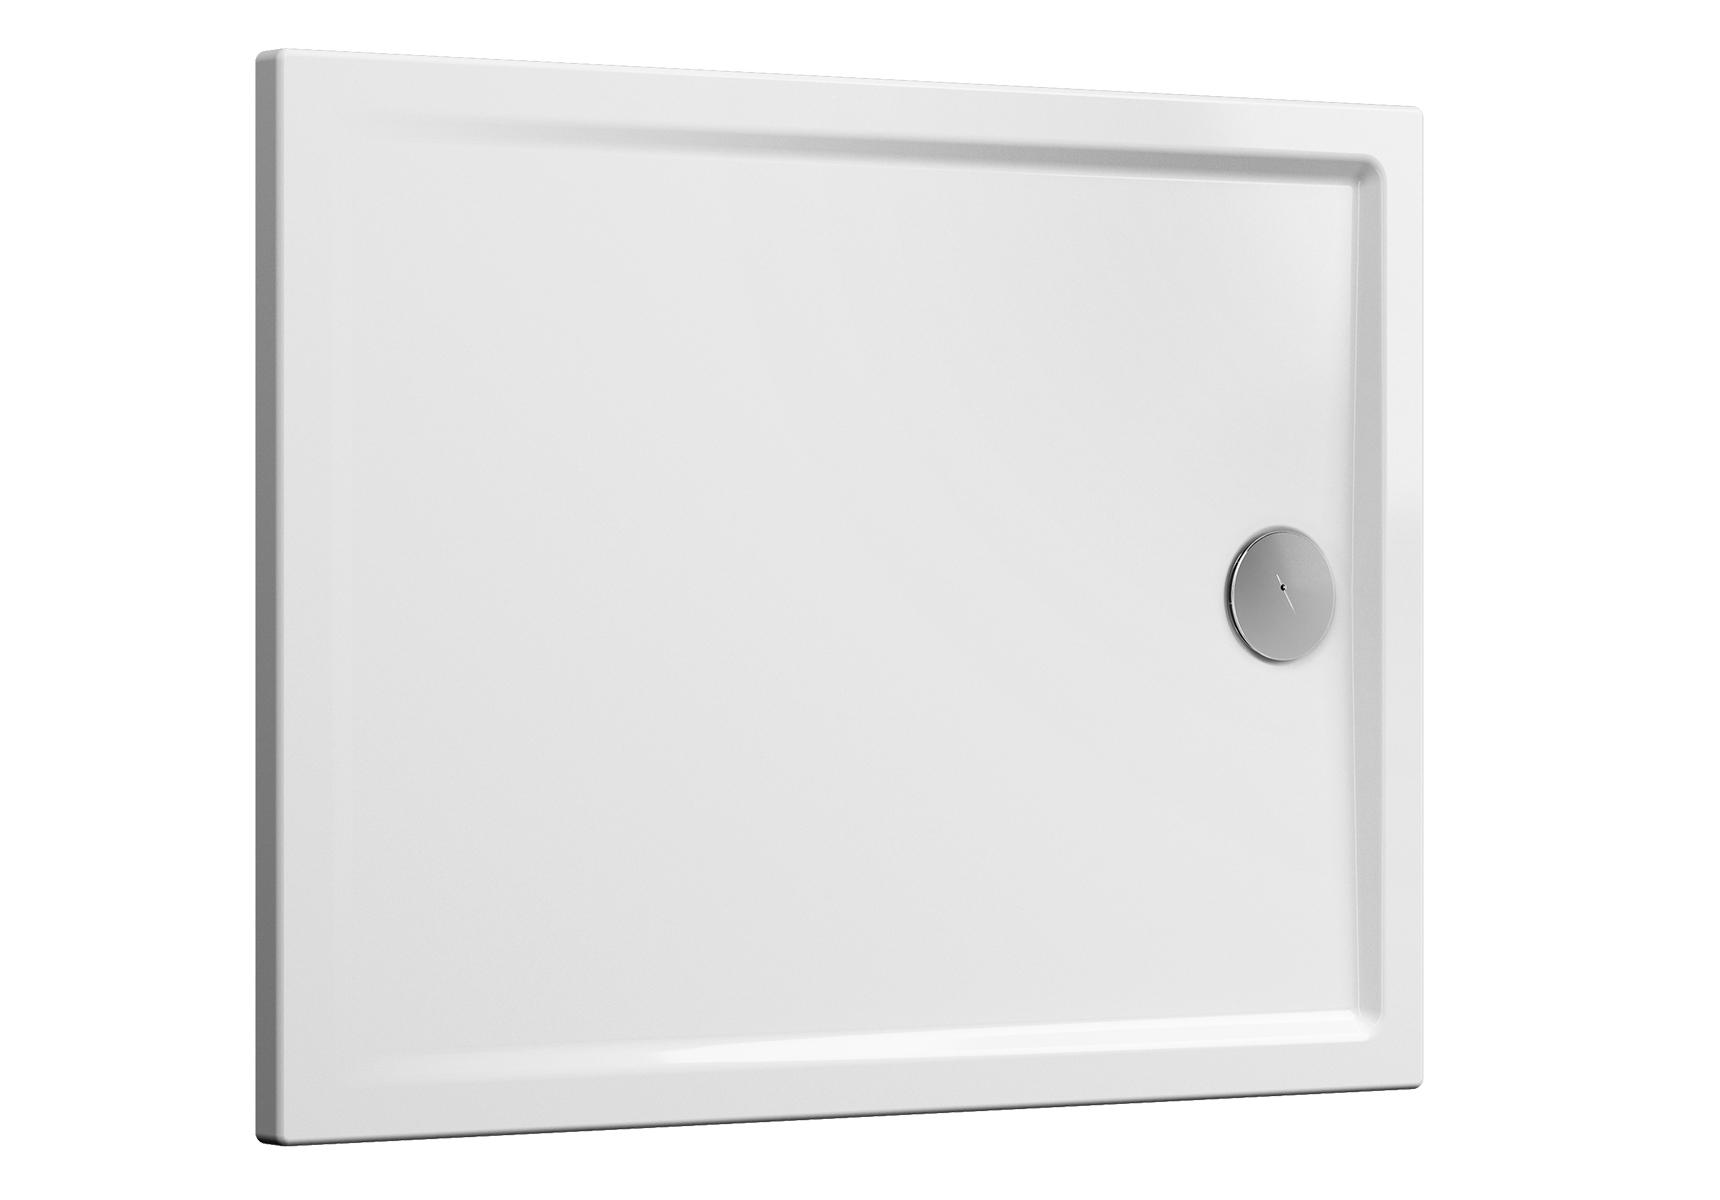 Cascade receveur ultra plat en céramique, 120  x  90 cm, blanc mat